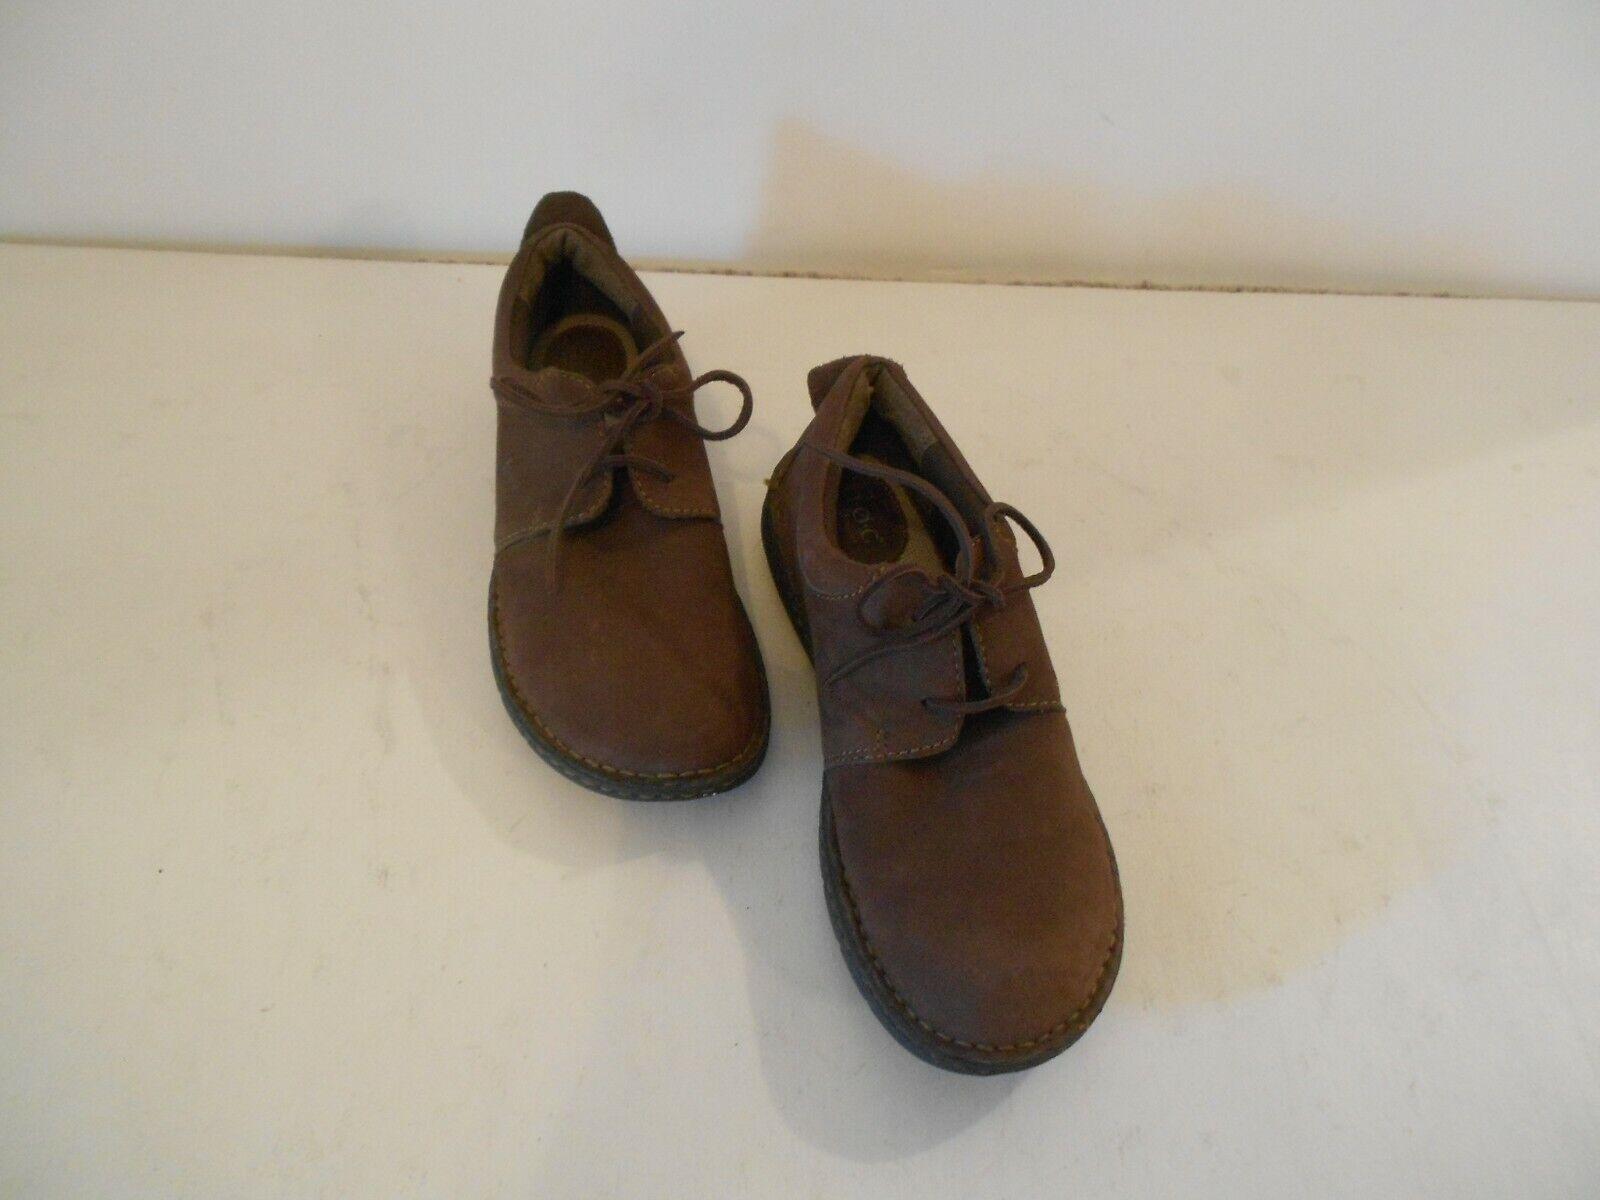 Women's Born Concept Brown Suede Leather Shoes Laceups US 10 EUR 42 Comfy Insole